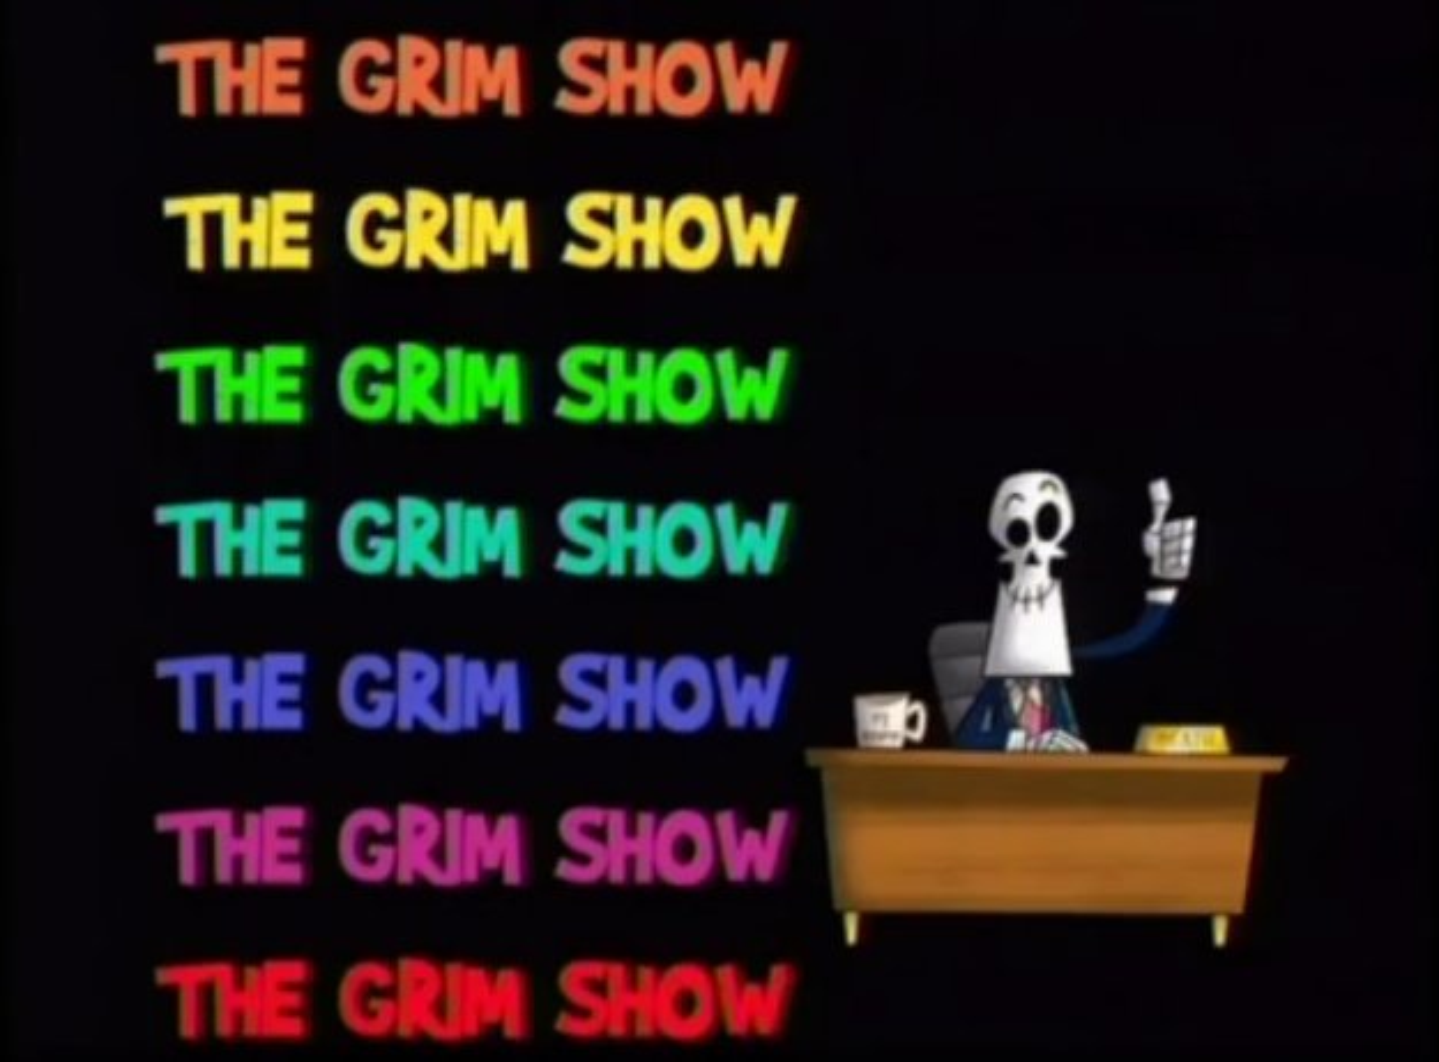 File:TheGrimShowTitleCard.png